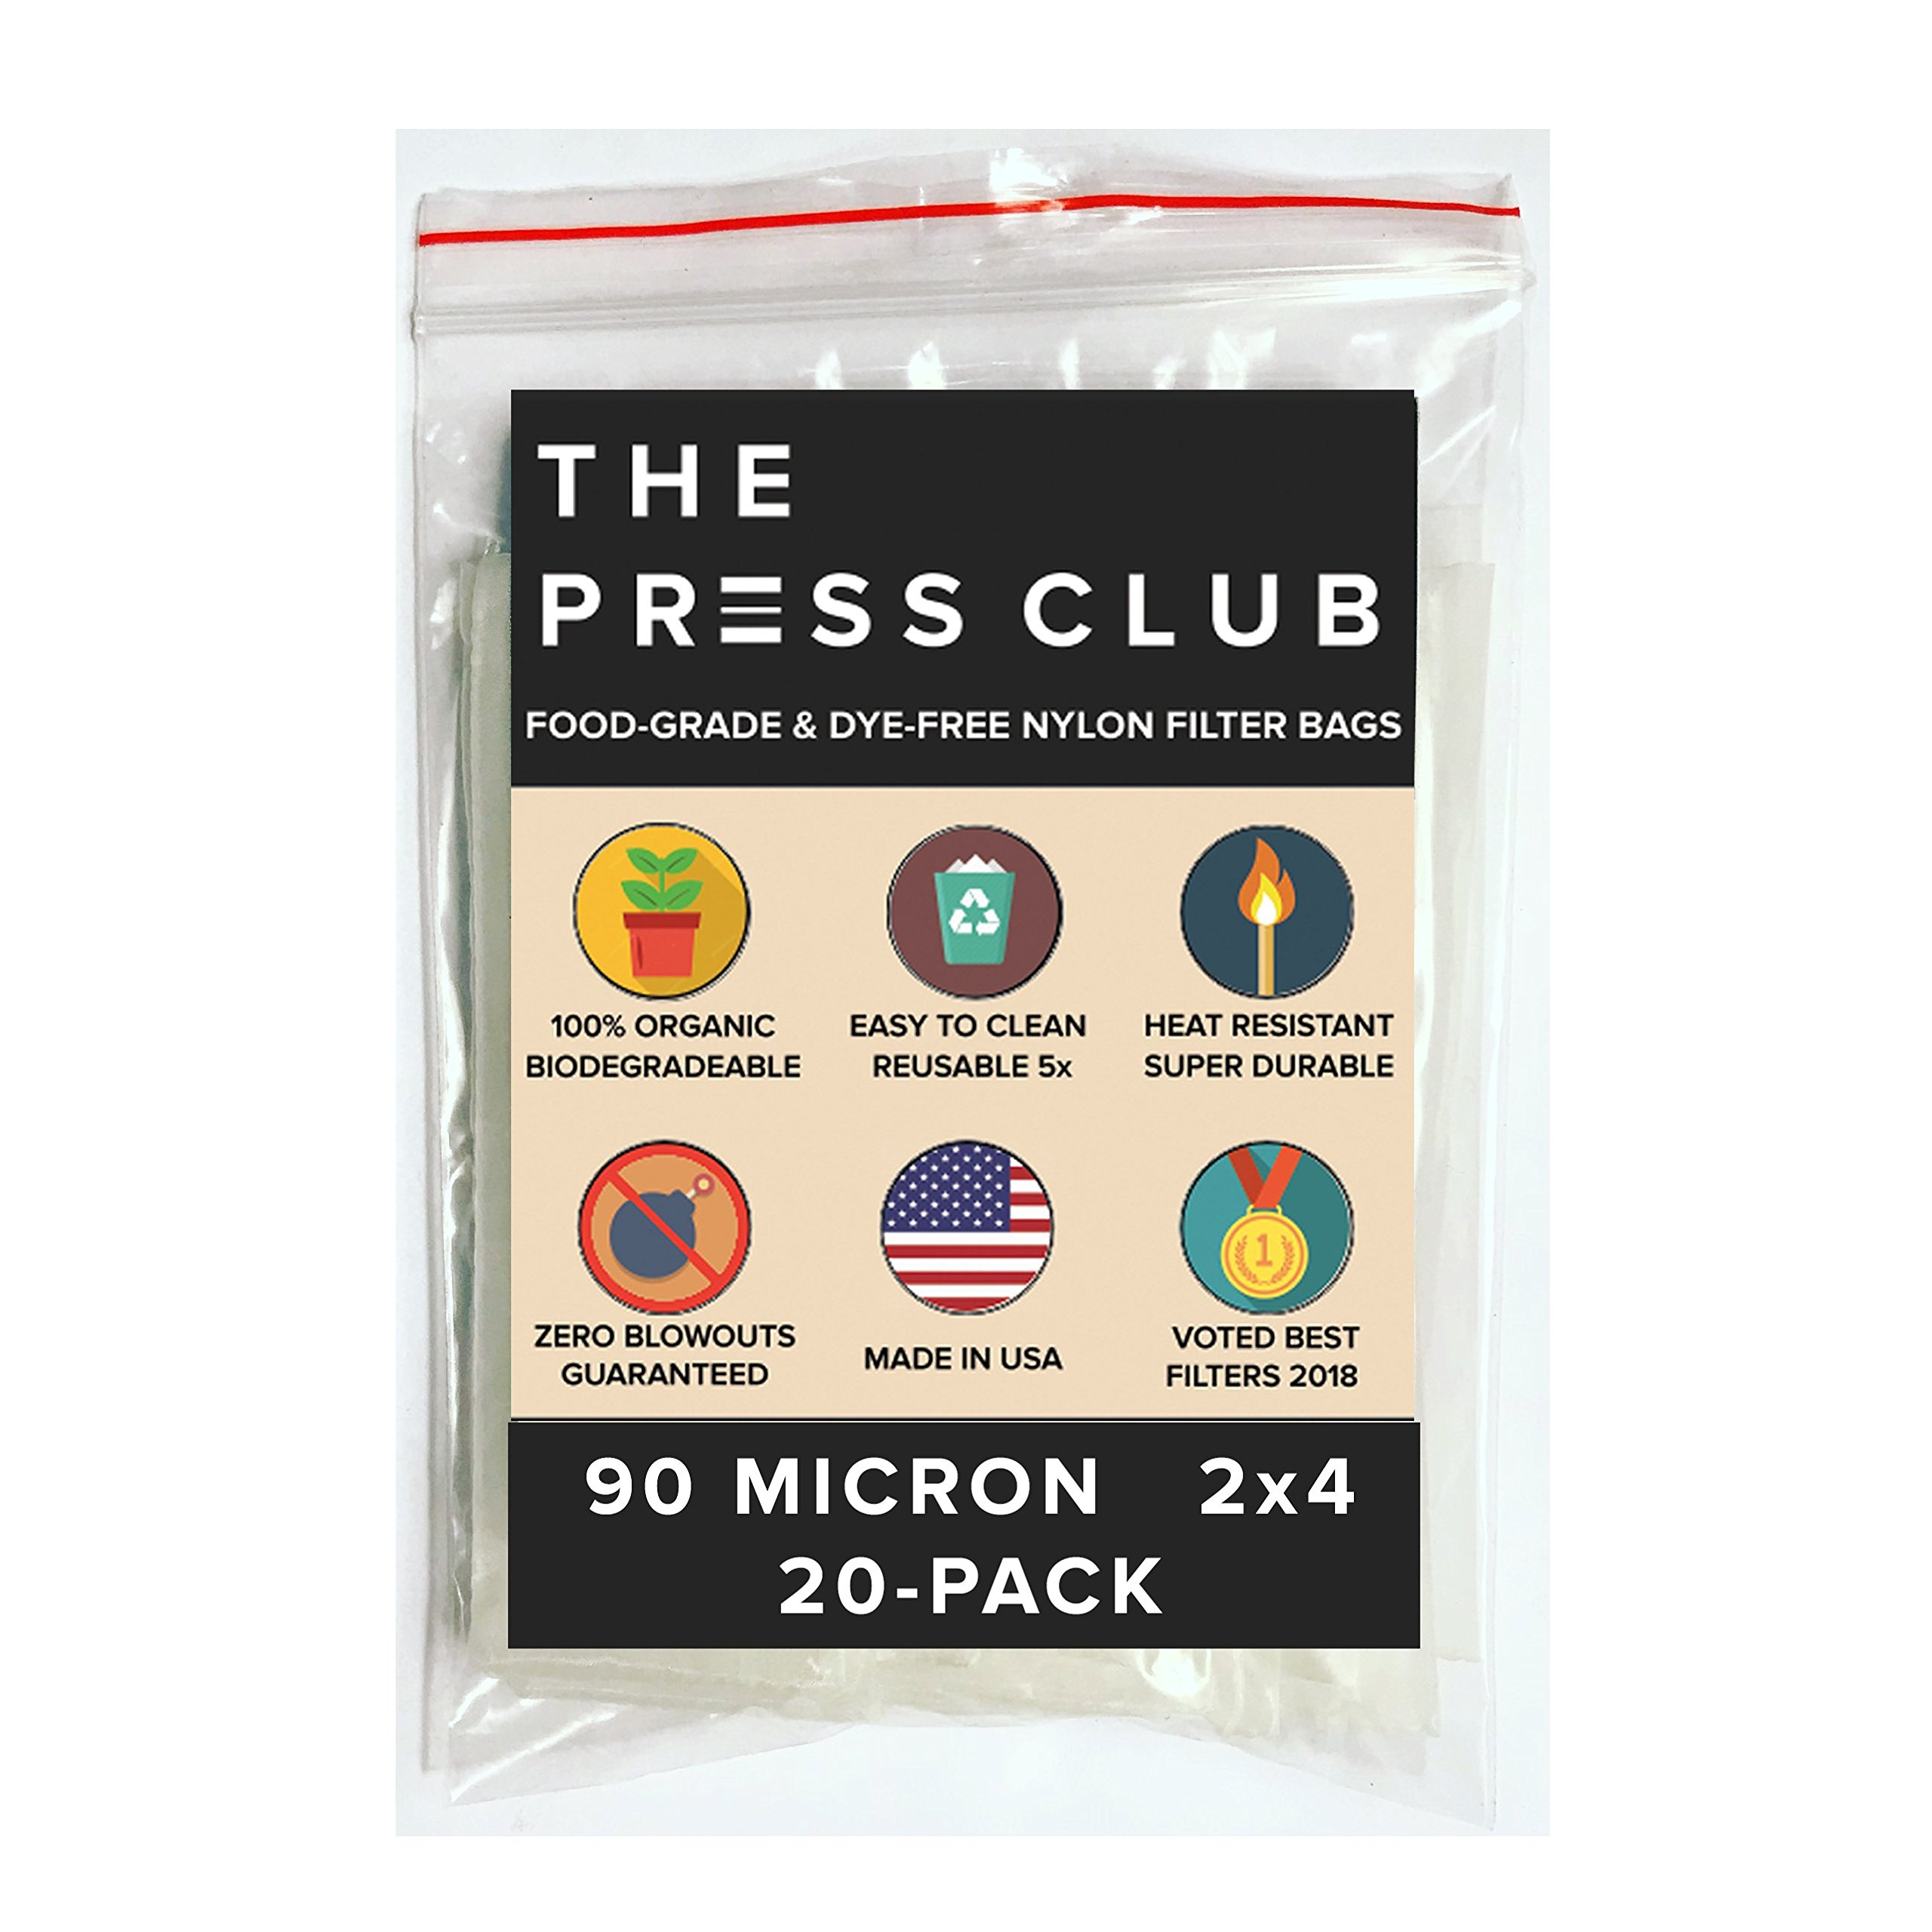 90 Micron | Premium Nylon Tea Filter Press Screen Bags | 2'' x 4'' | 20 Pack | Zero Blowout Guarantee | All Micron & Sizes Available